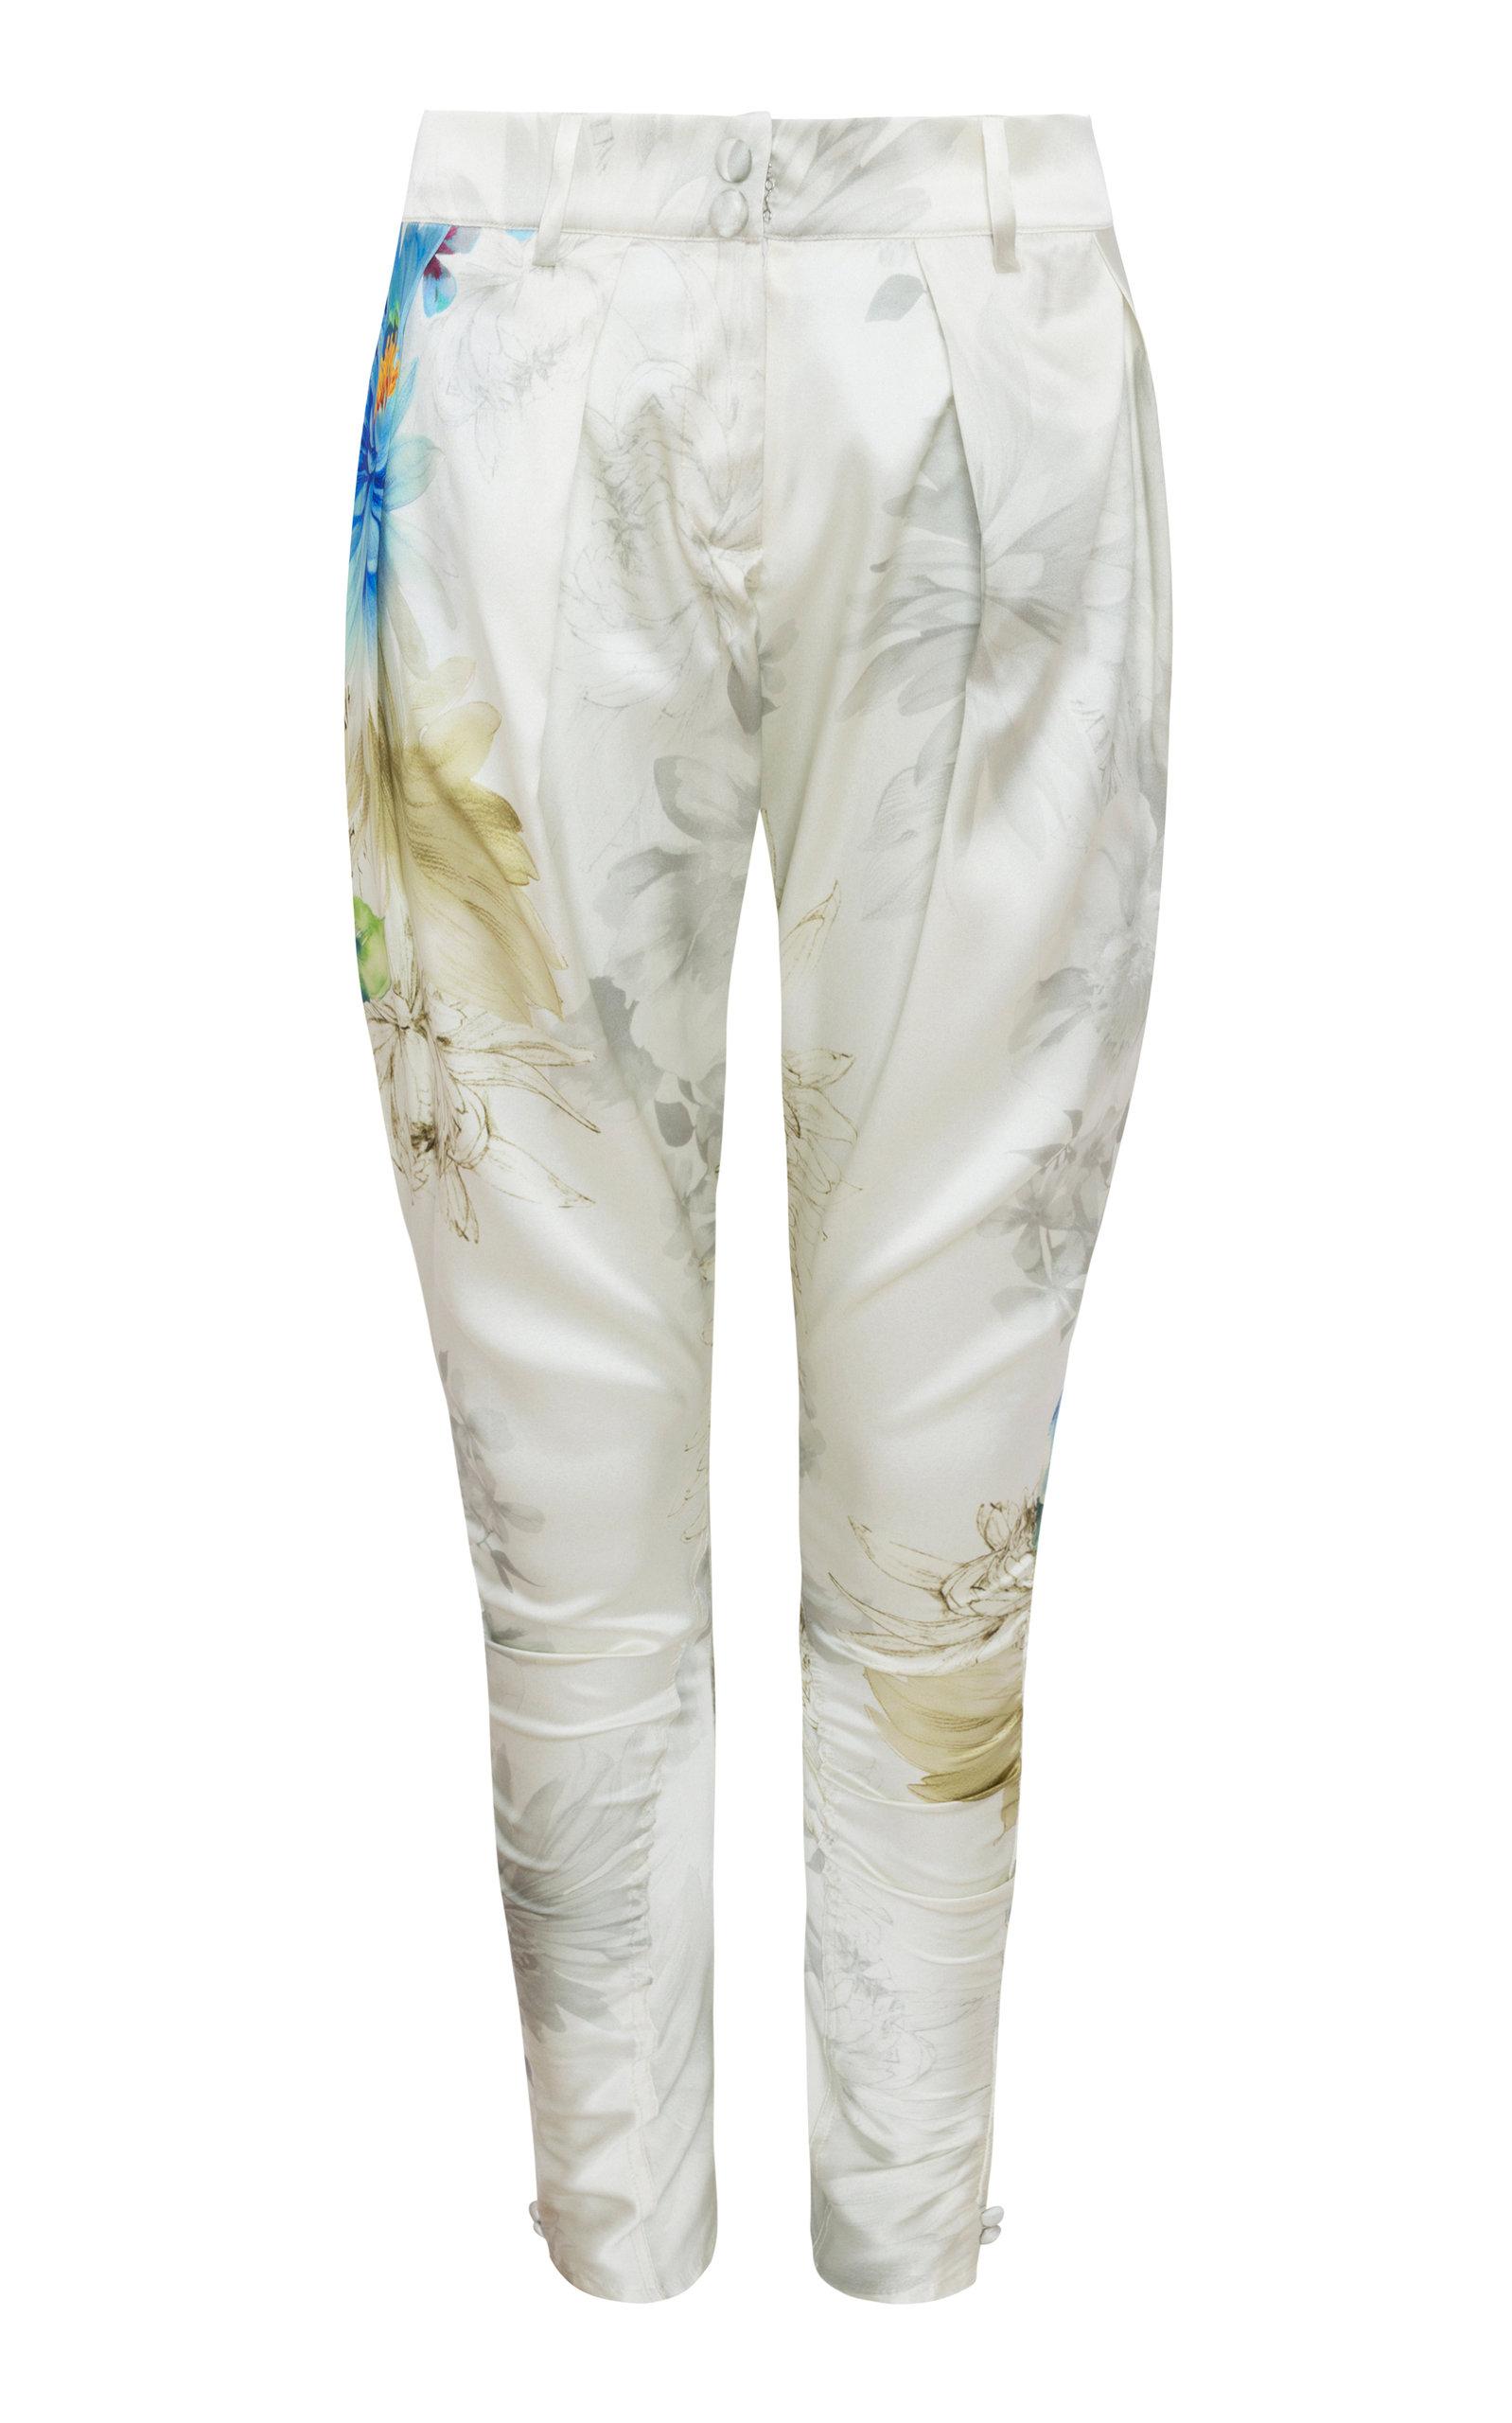 ADRIANA IGLESIAS Hudson Pleated Silk Satin Pants in Floral